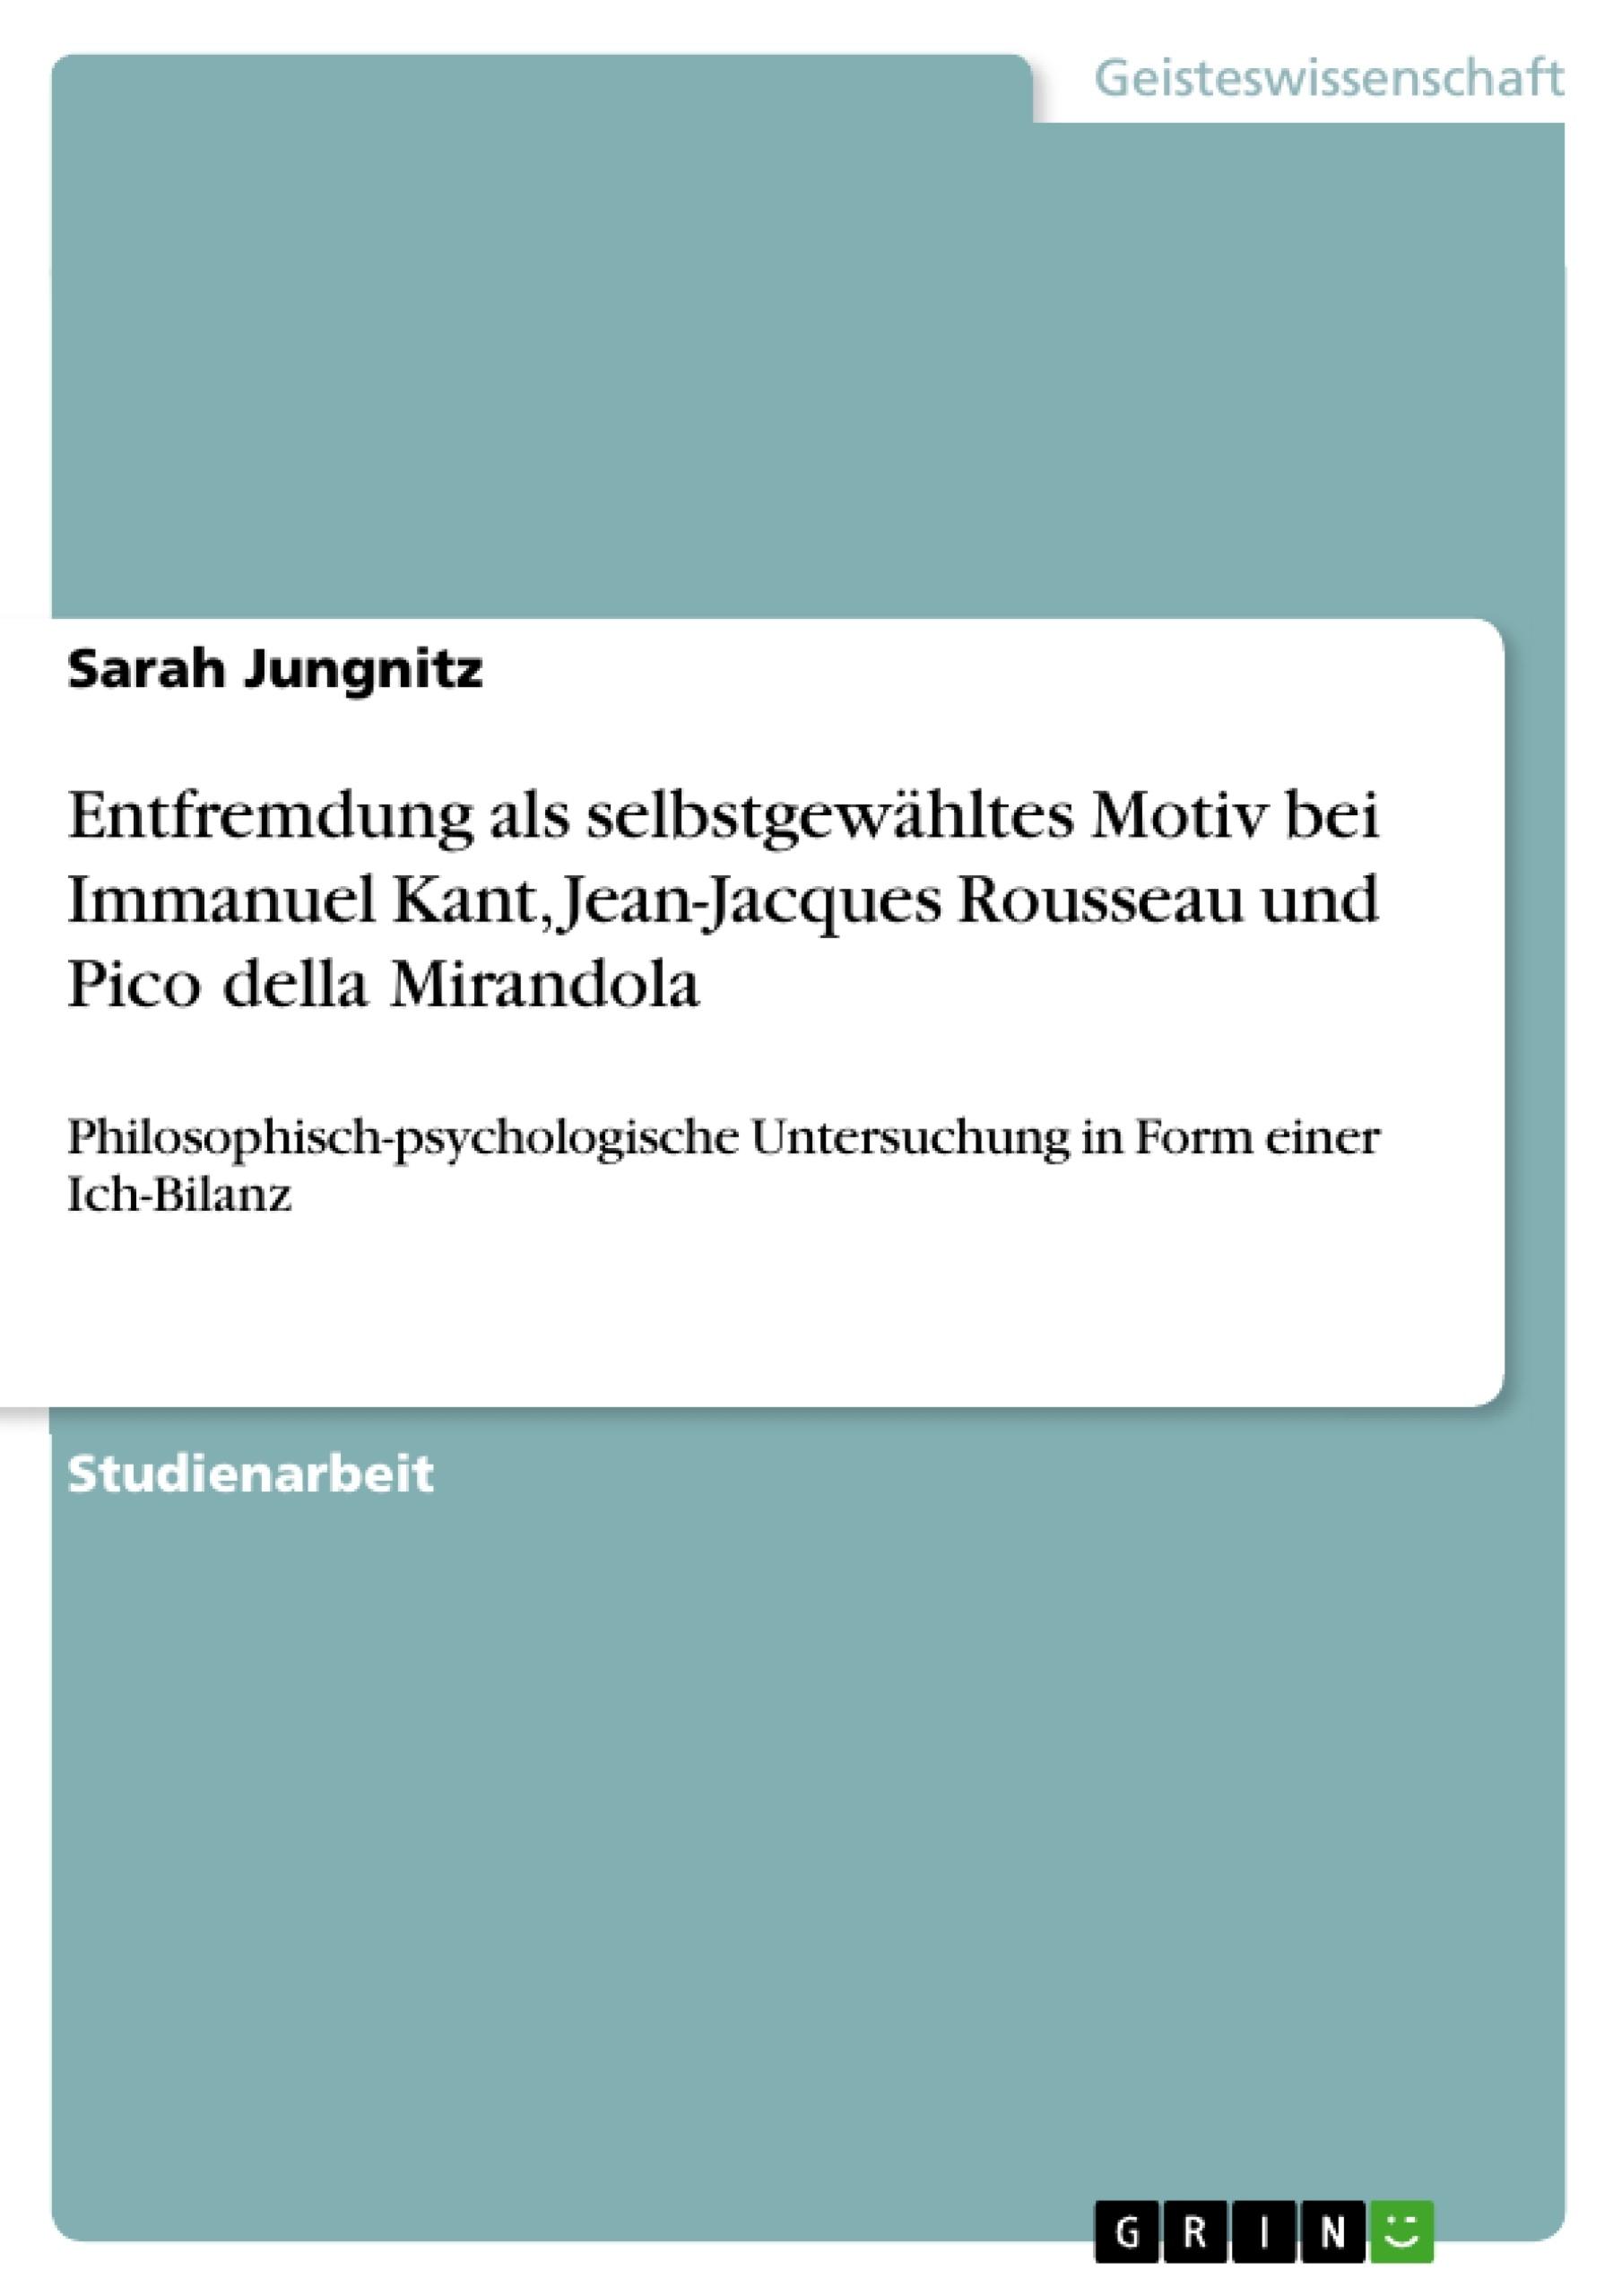 Titel: Entfremdung als selbstgewähltes Motiv bei Immanuel Kant, Jean-Jacques Rousseau und Pico della Mirandola